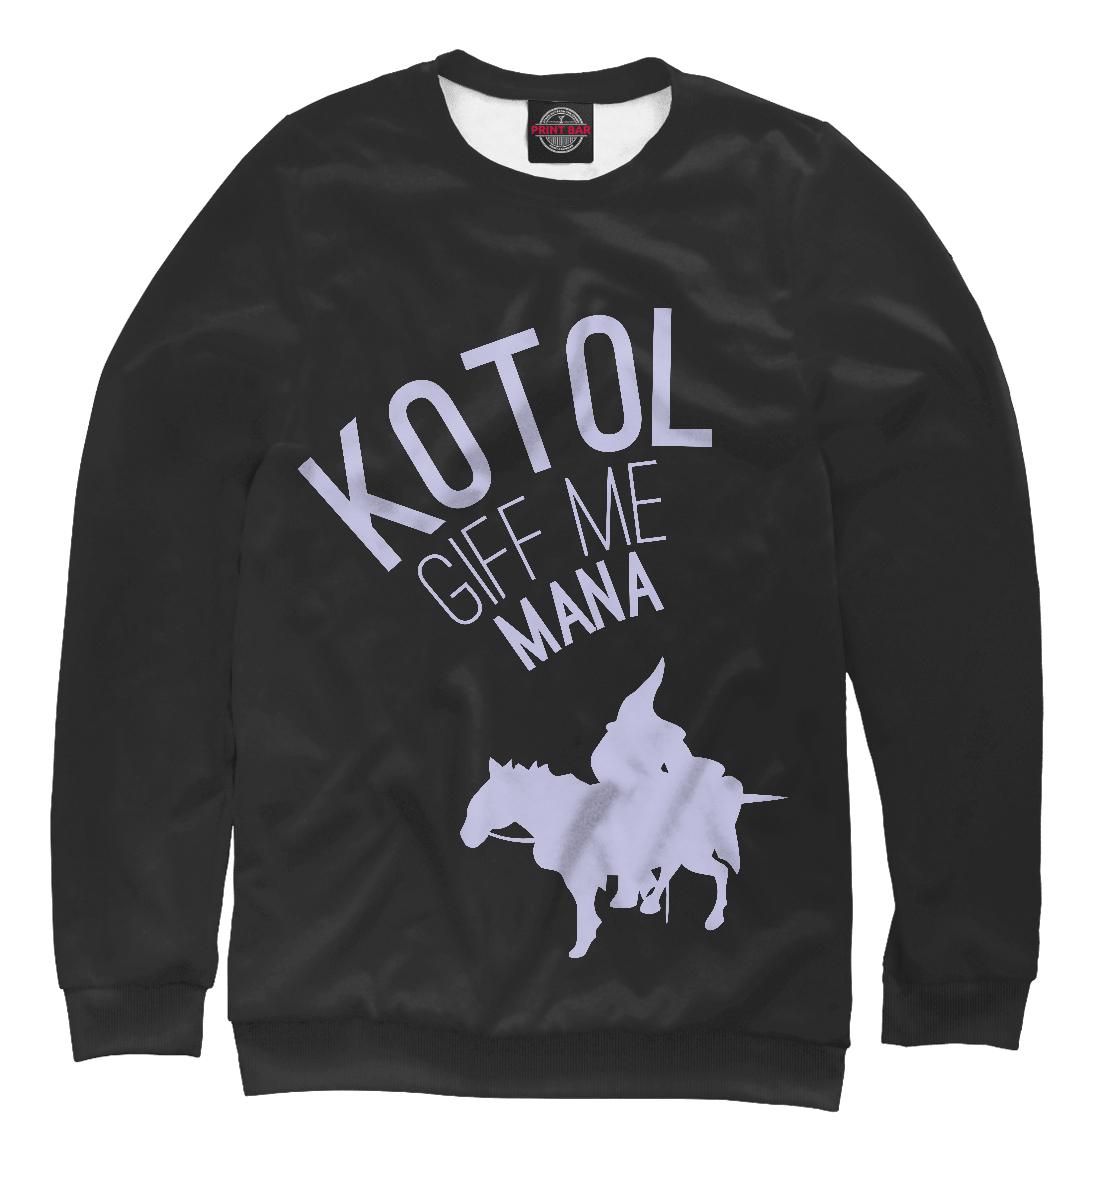 Купить Kotol Giff Me Mana, Printbar, Свитшоты, DO2-419015-swi-1